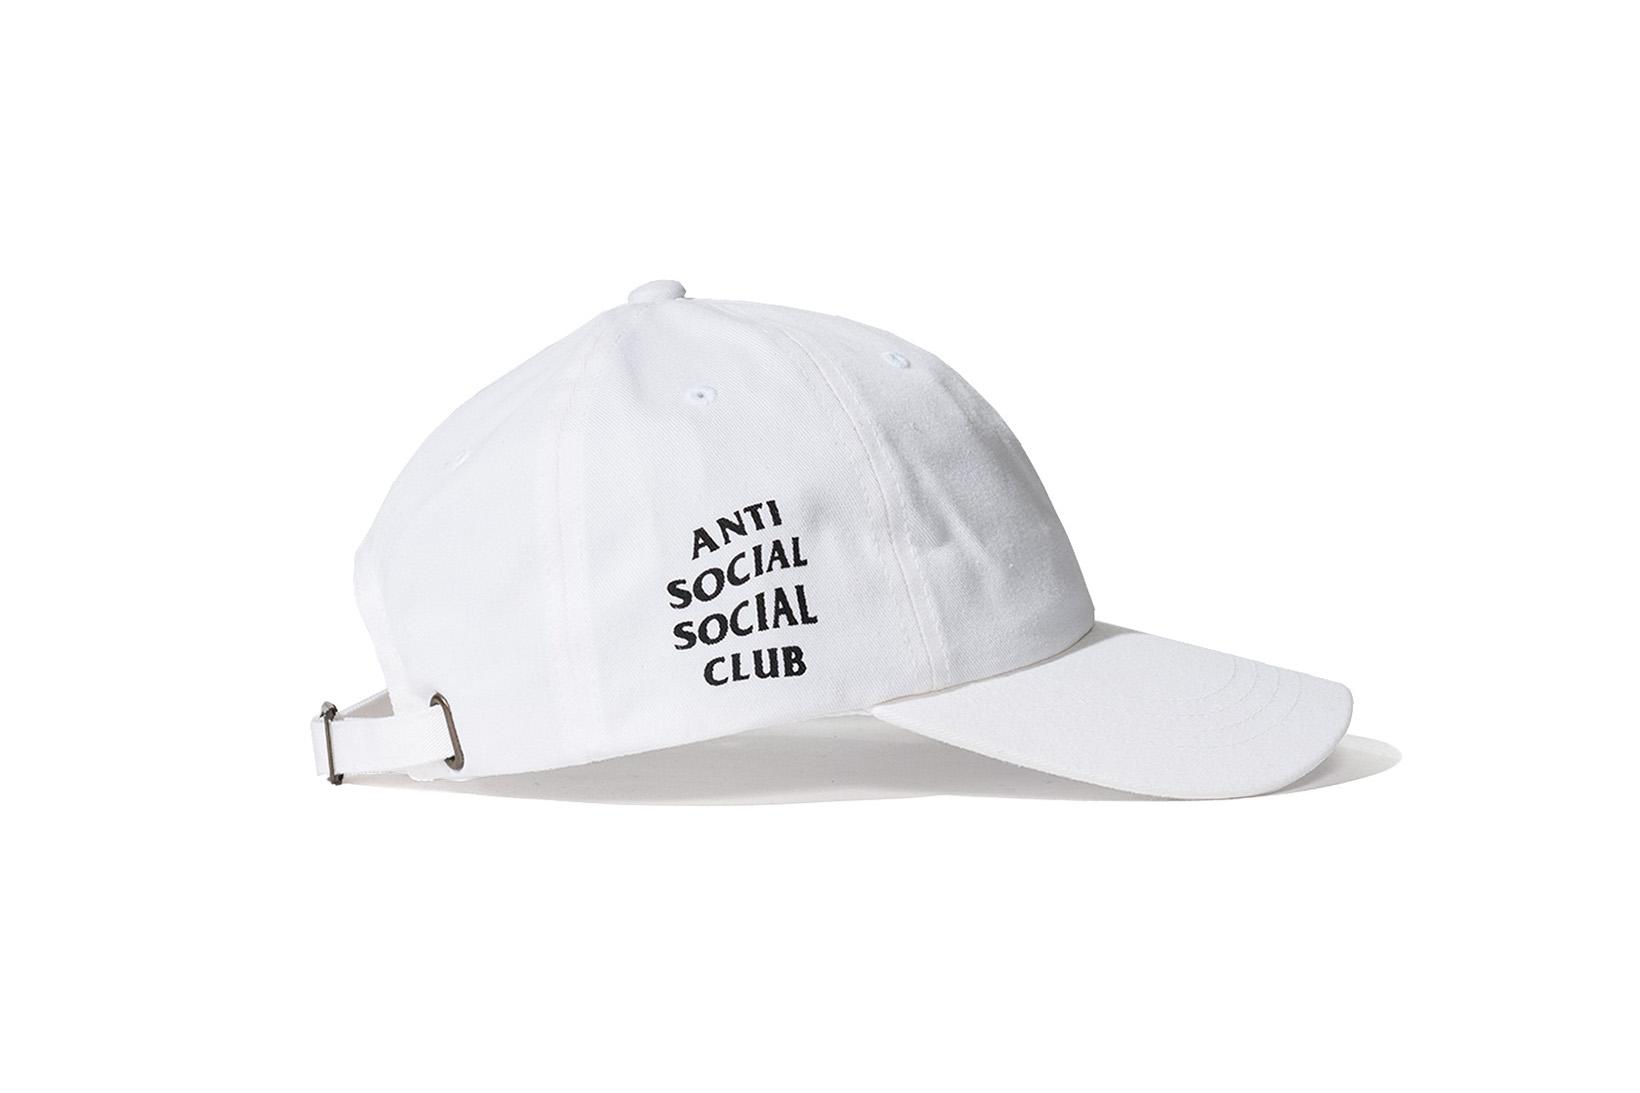 Anti Social Social Club 2017 Spring Summer - 3744383